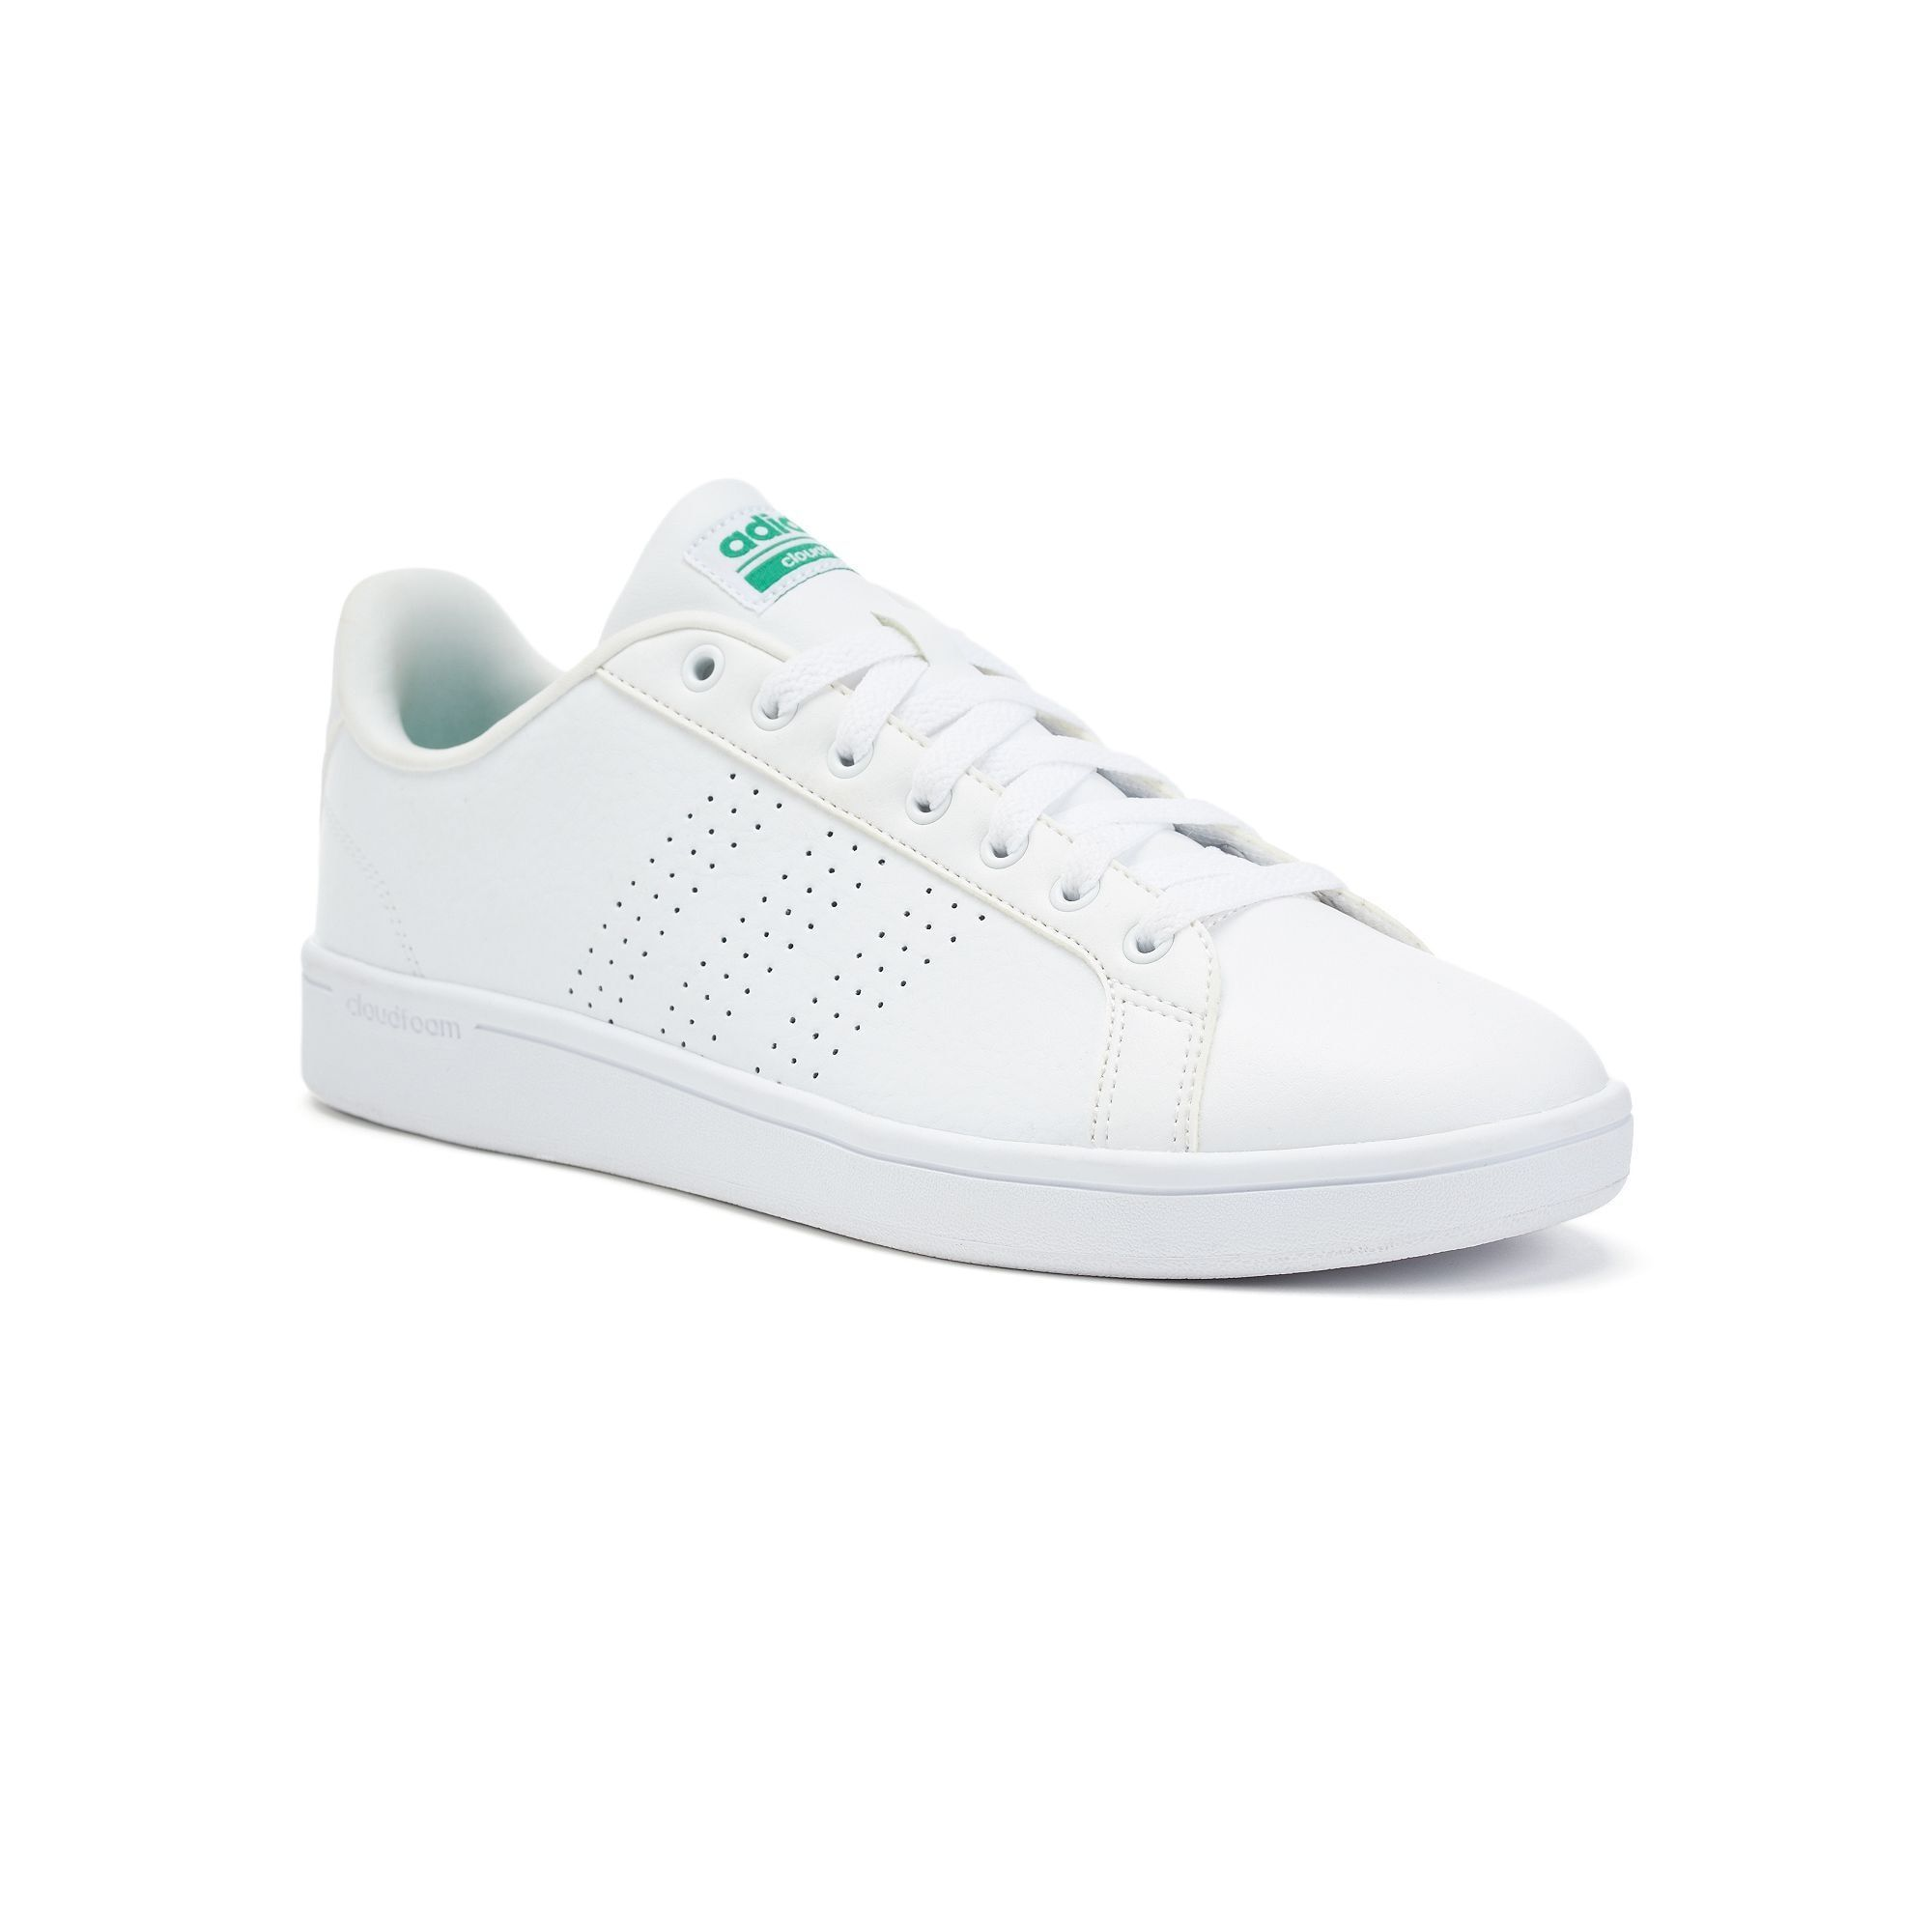 adidas NEO Cloudfoam Advantage Clean Men's Leather Sneakers ...